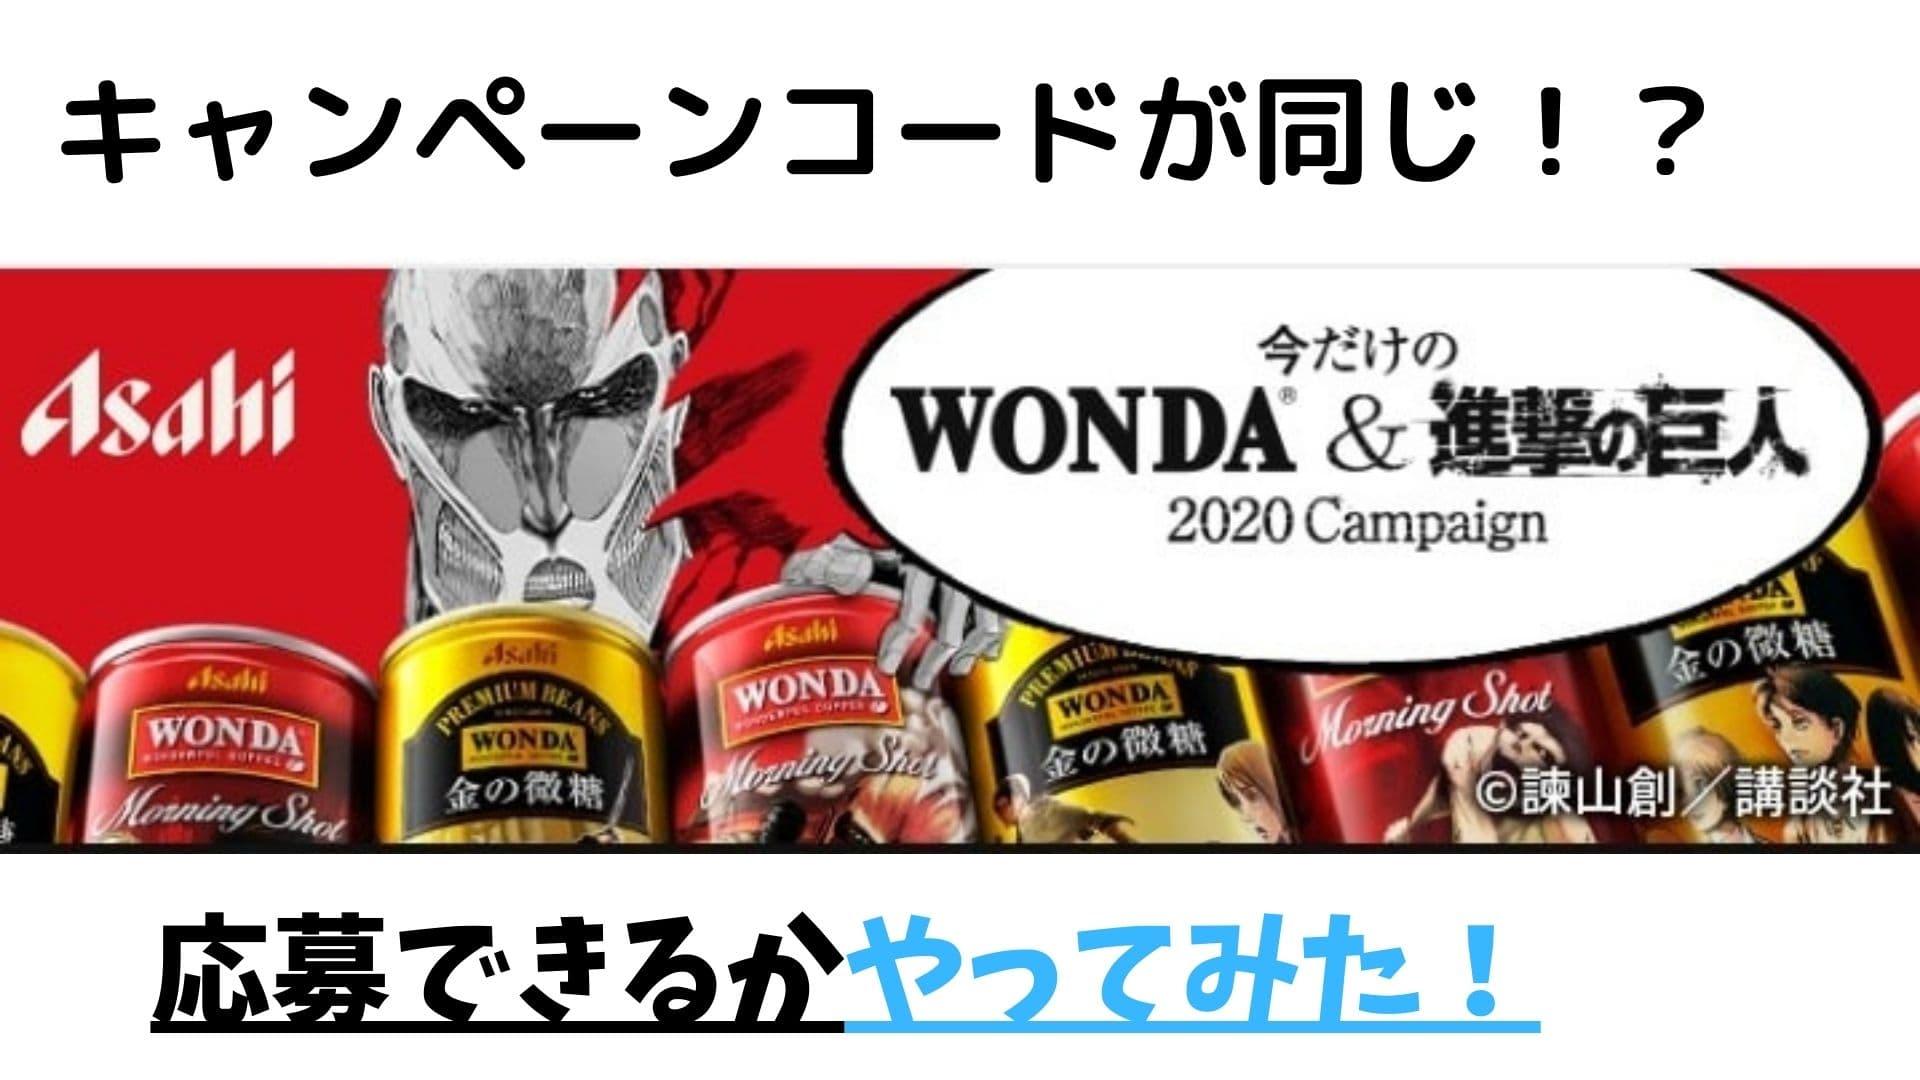 【WONDA&進撃の巨人コラボ】同じ種類でキャンペーンコードが同じだった件!?